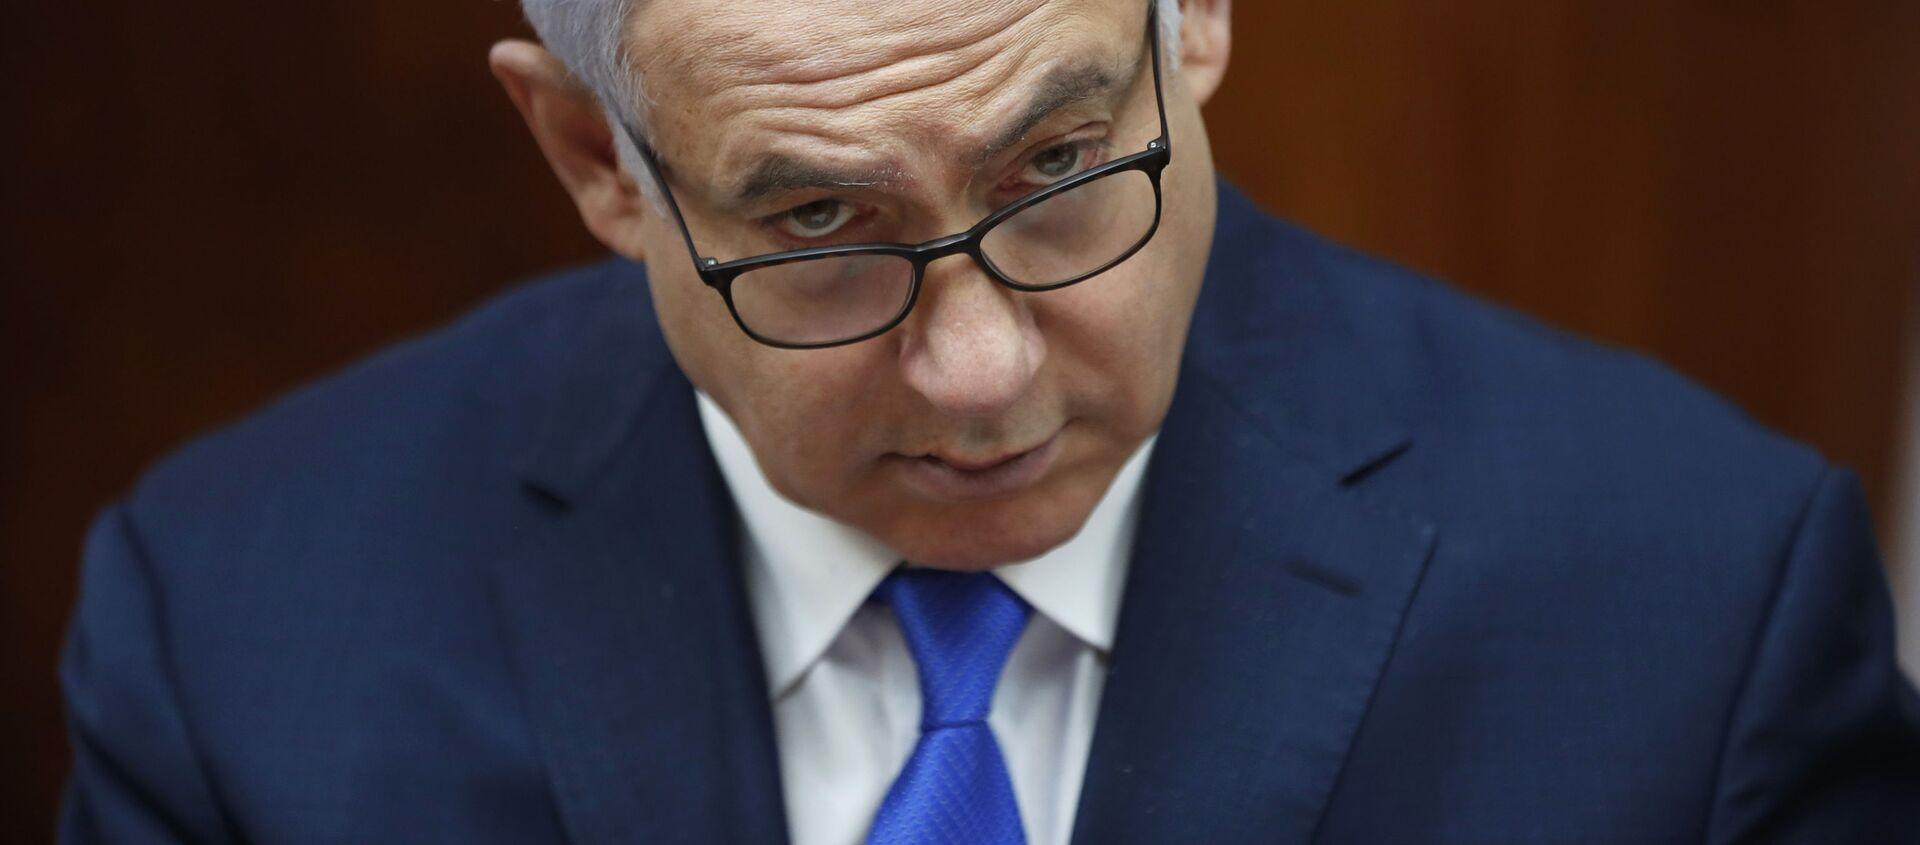 El primer ministro israelí Benjamín Netanyahu  - Sputnik Mundo, 1920, 08.02.2021